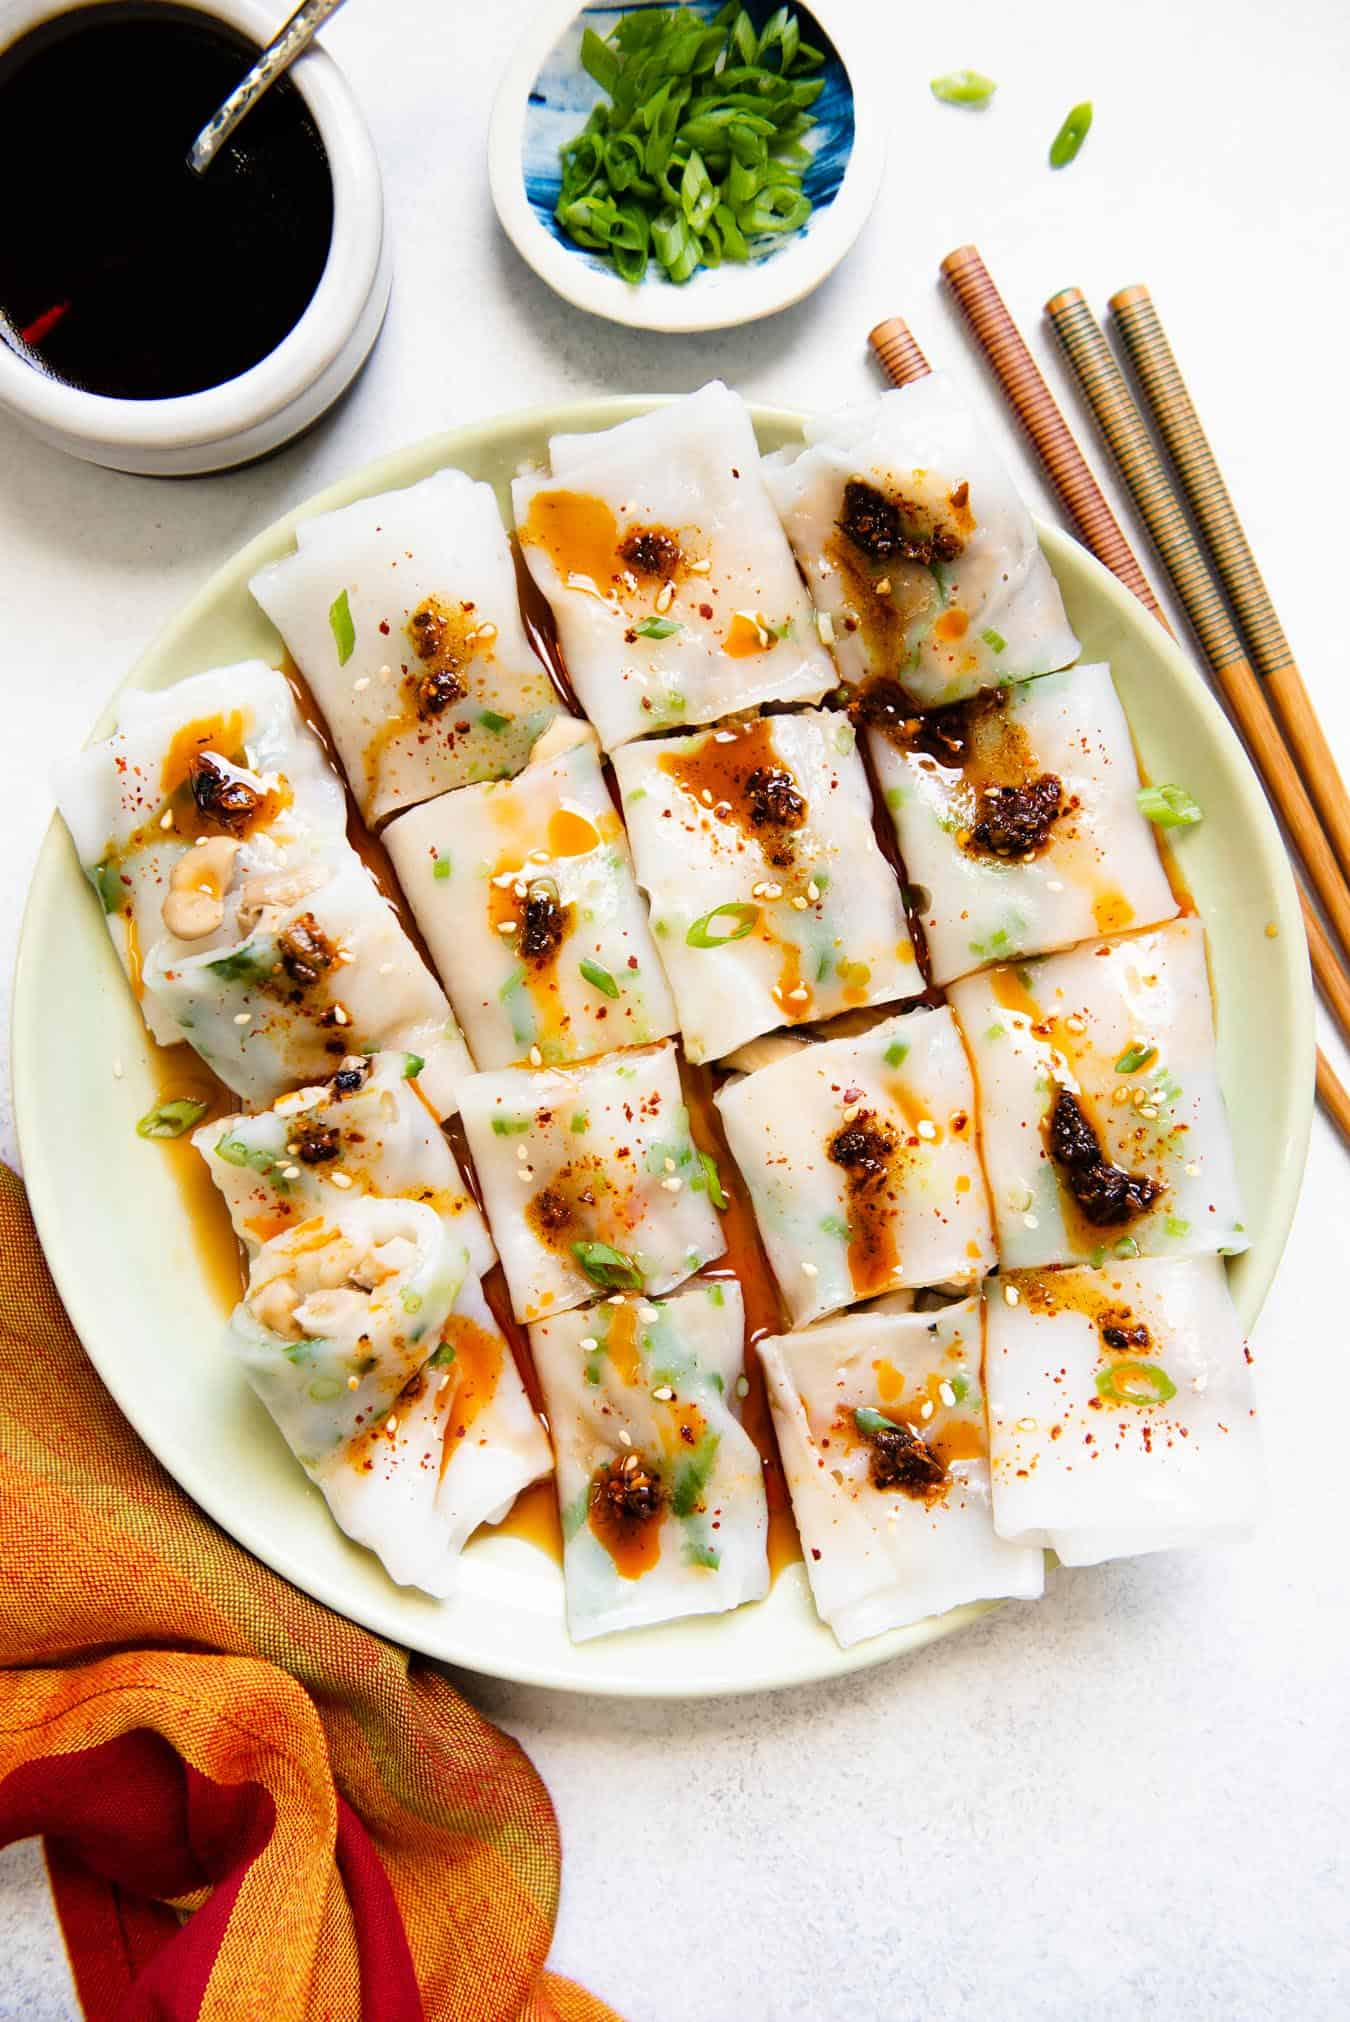 Mixed Mushroom Cheung Fun Recipe